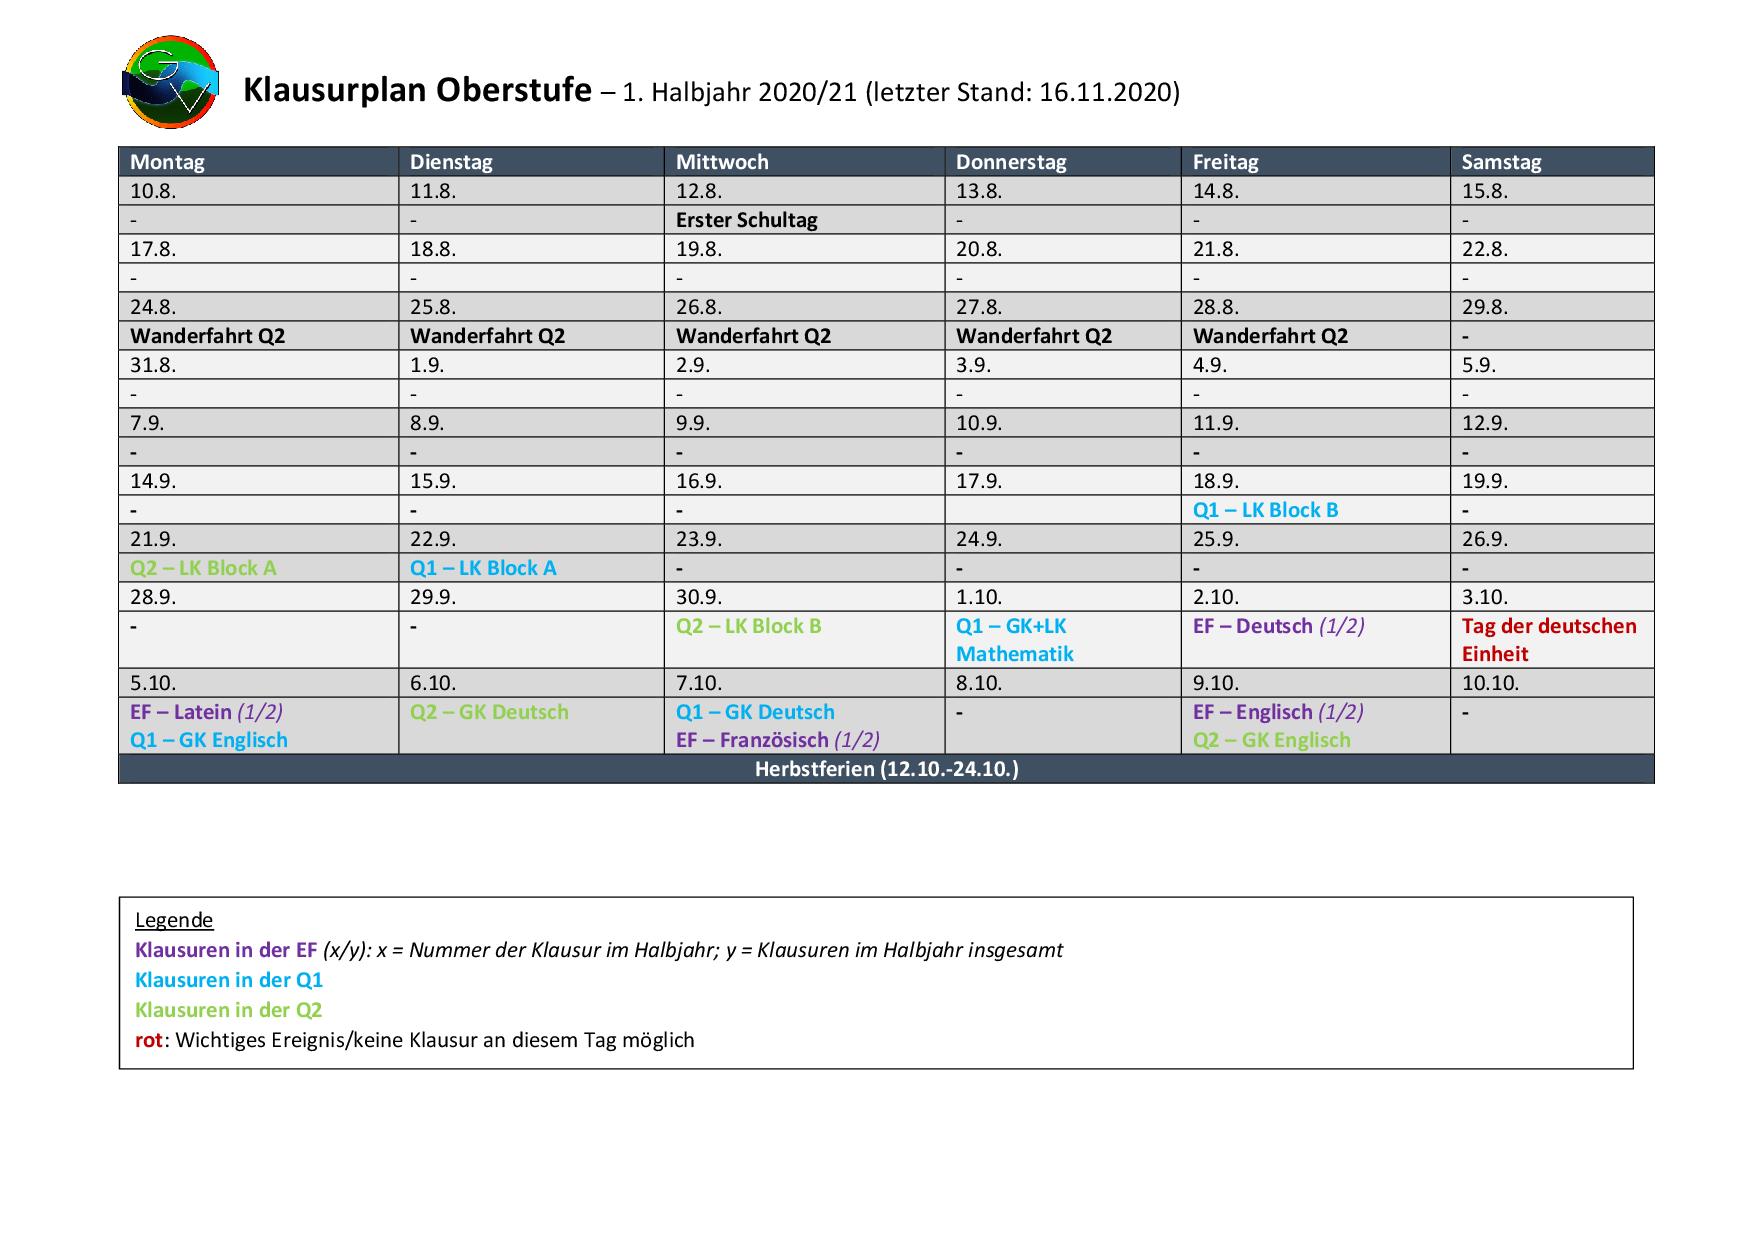 2020-11-16_Klausurplan-Oberstufe-1HJ-001